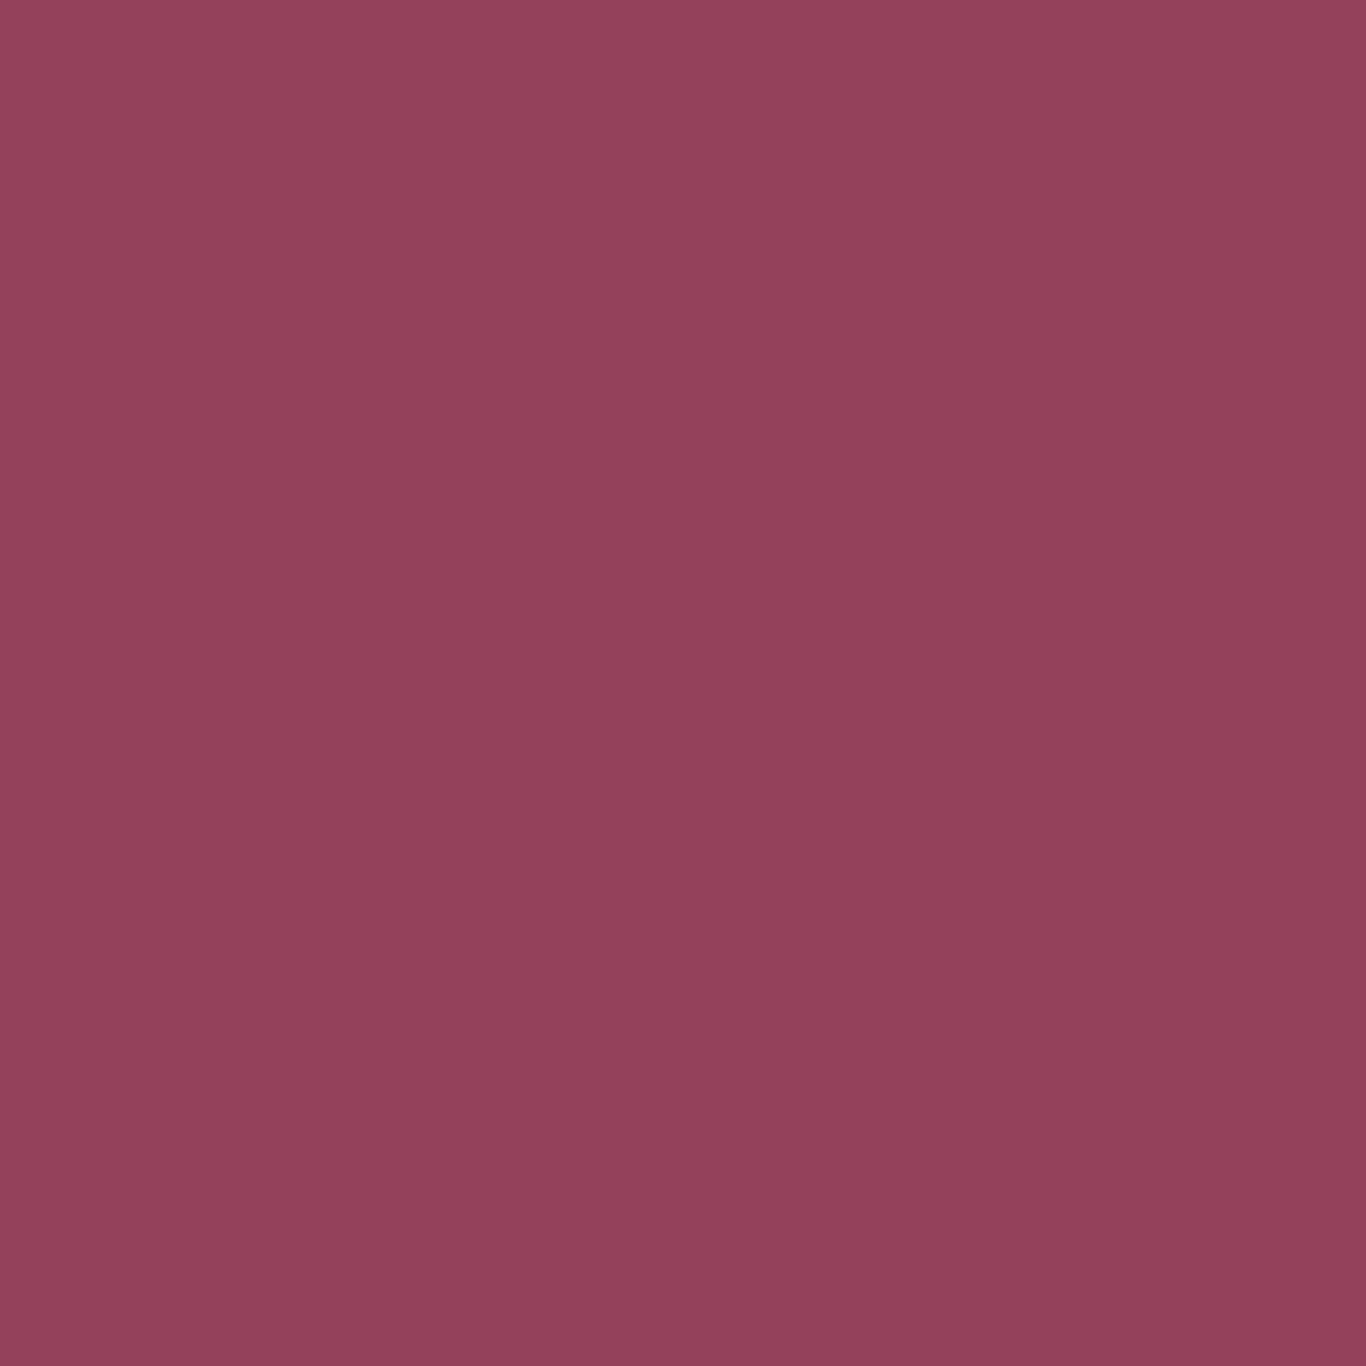 Zoffany Paint Raspberry Sorbet